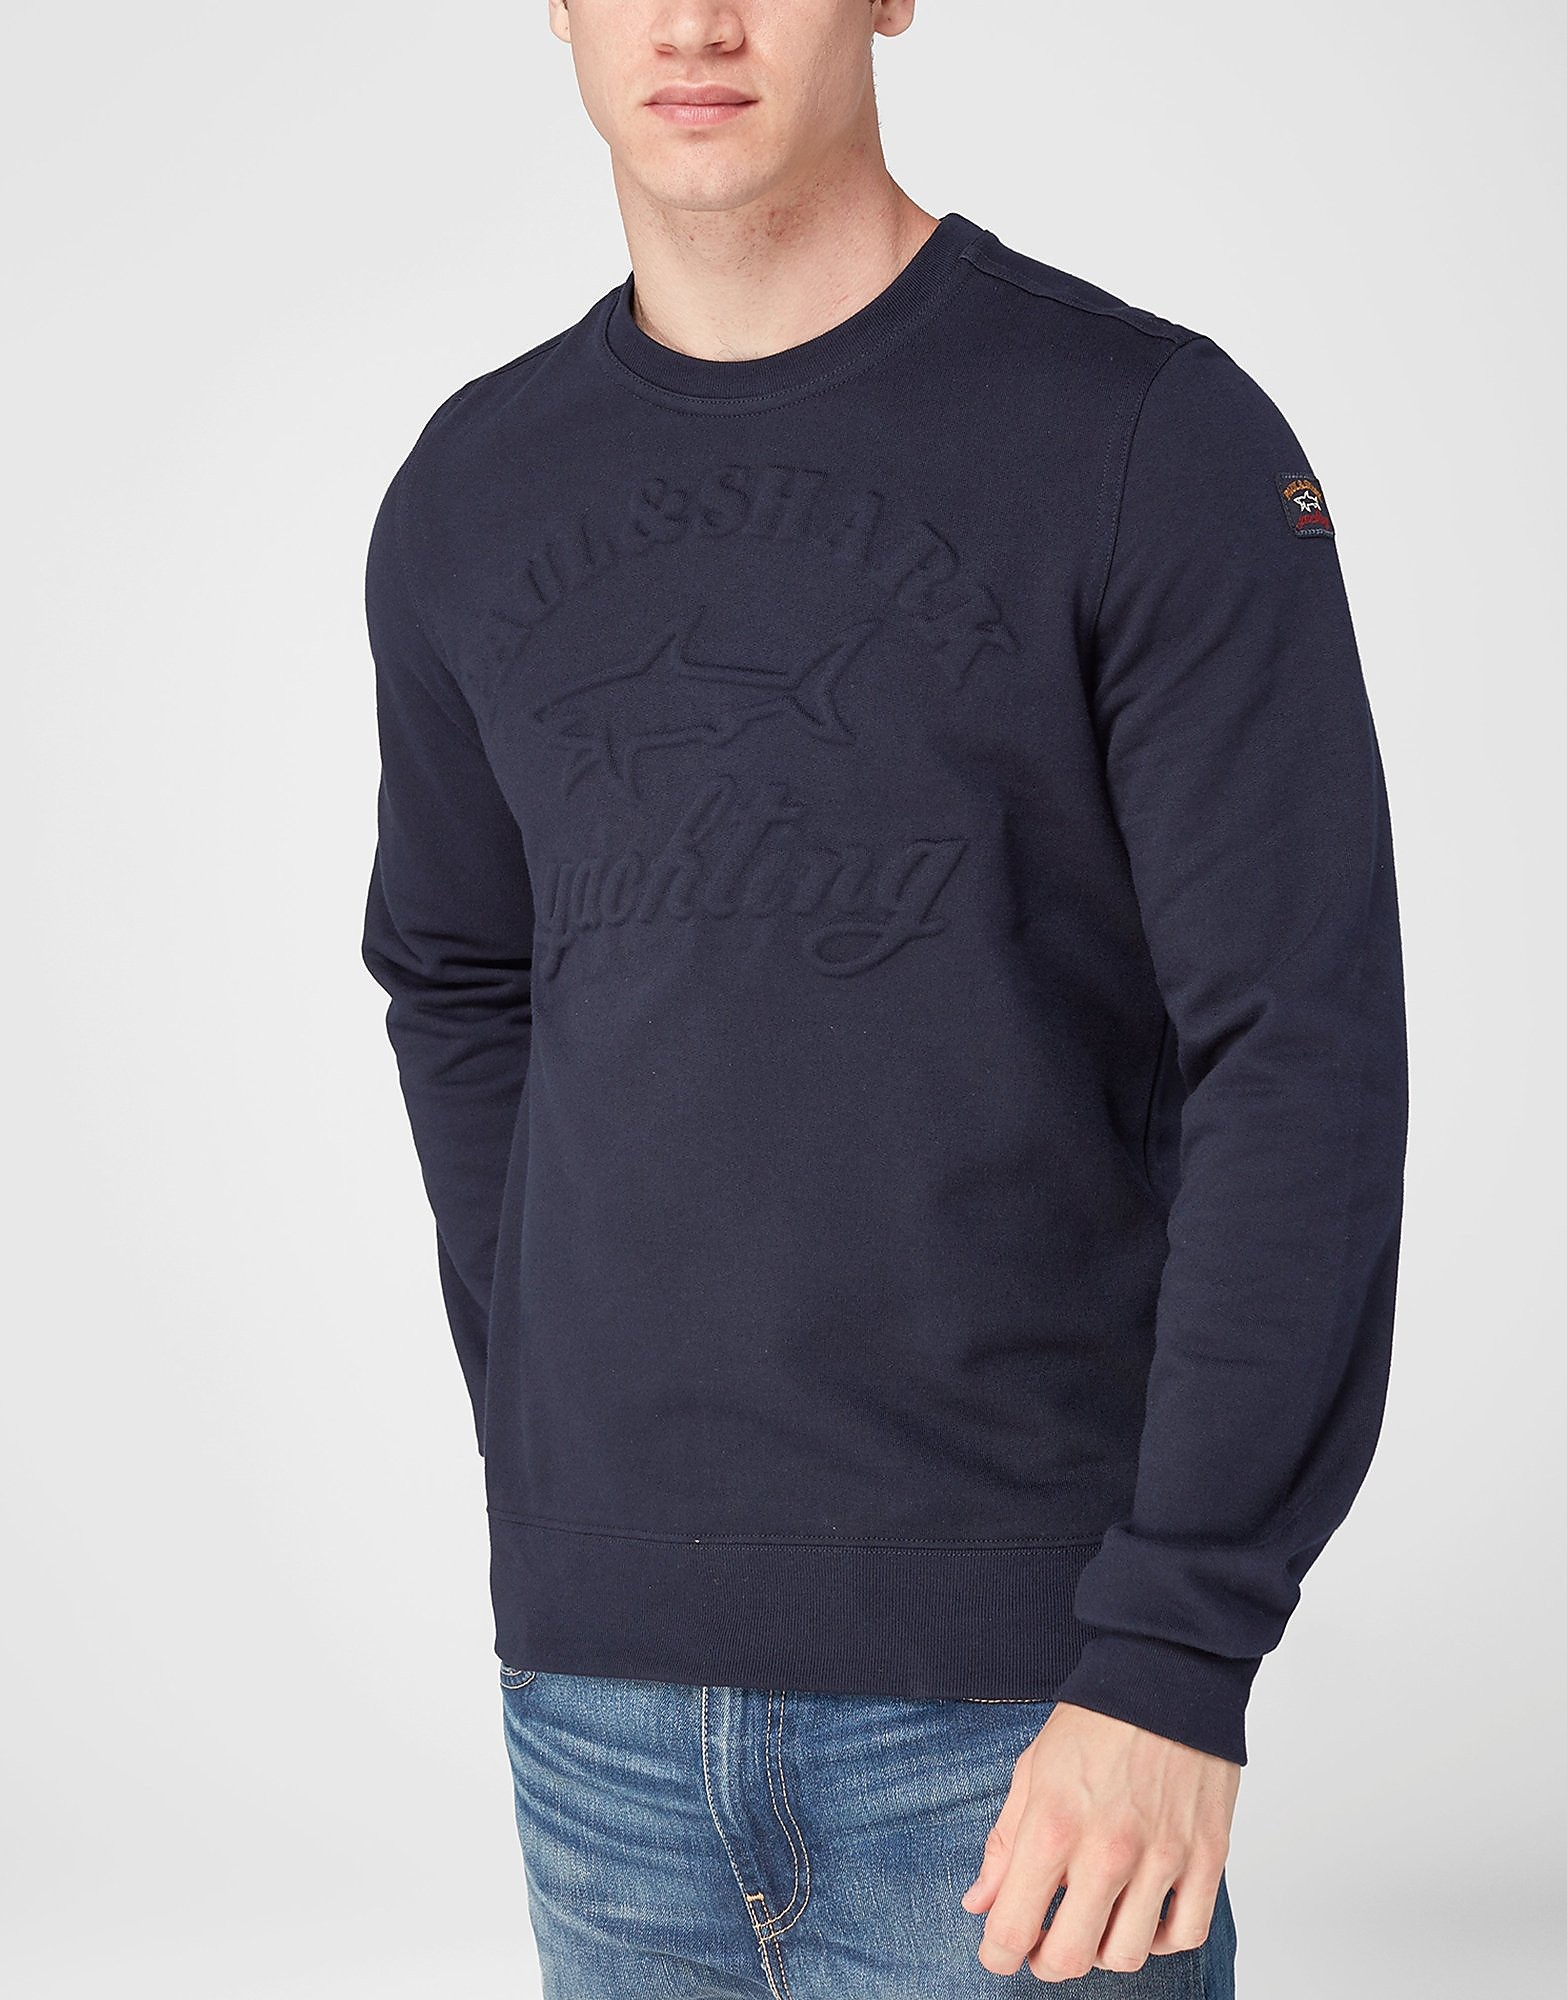 Paul and Shark Embossed Crew Sweatshirt